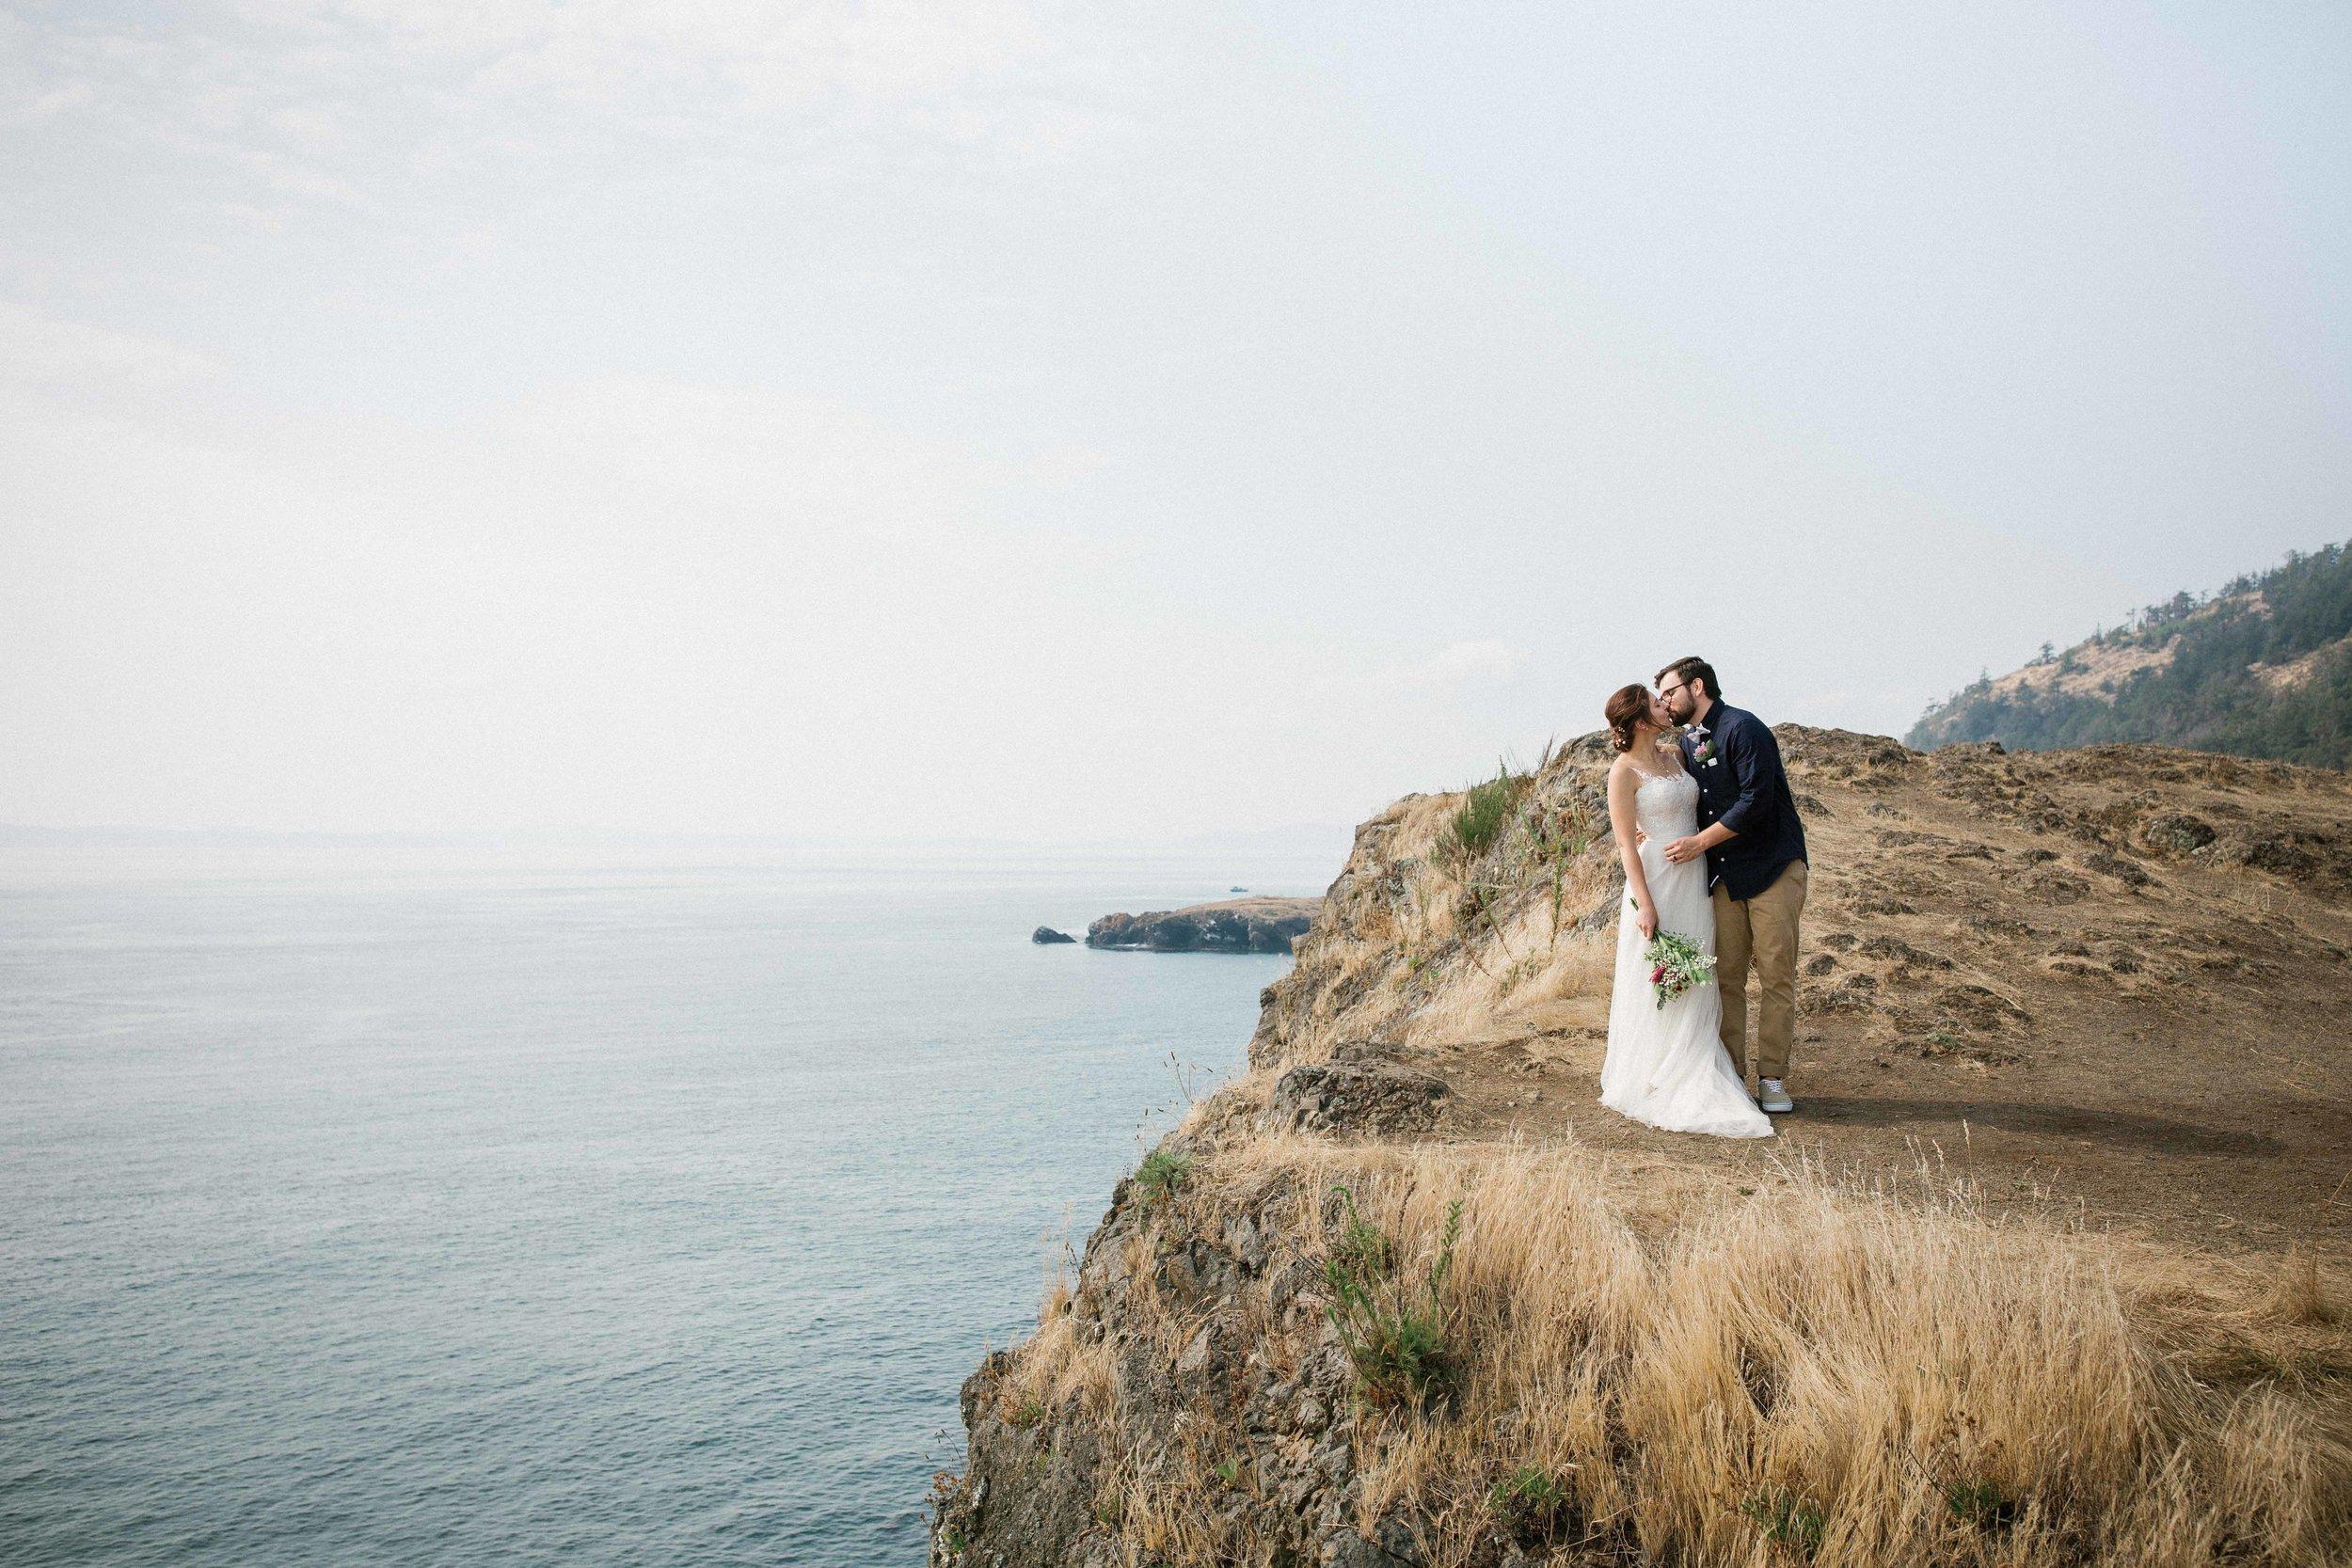 deception-pass-wedding-46.jpg